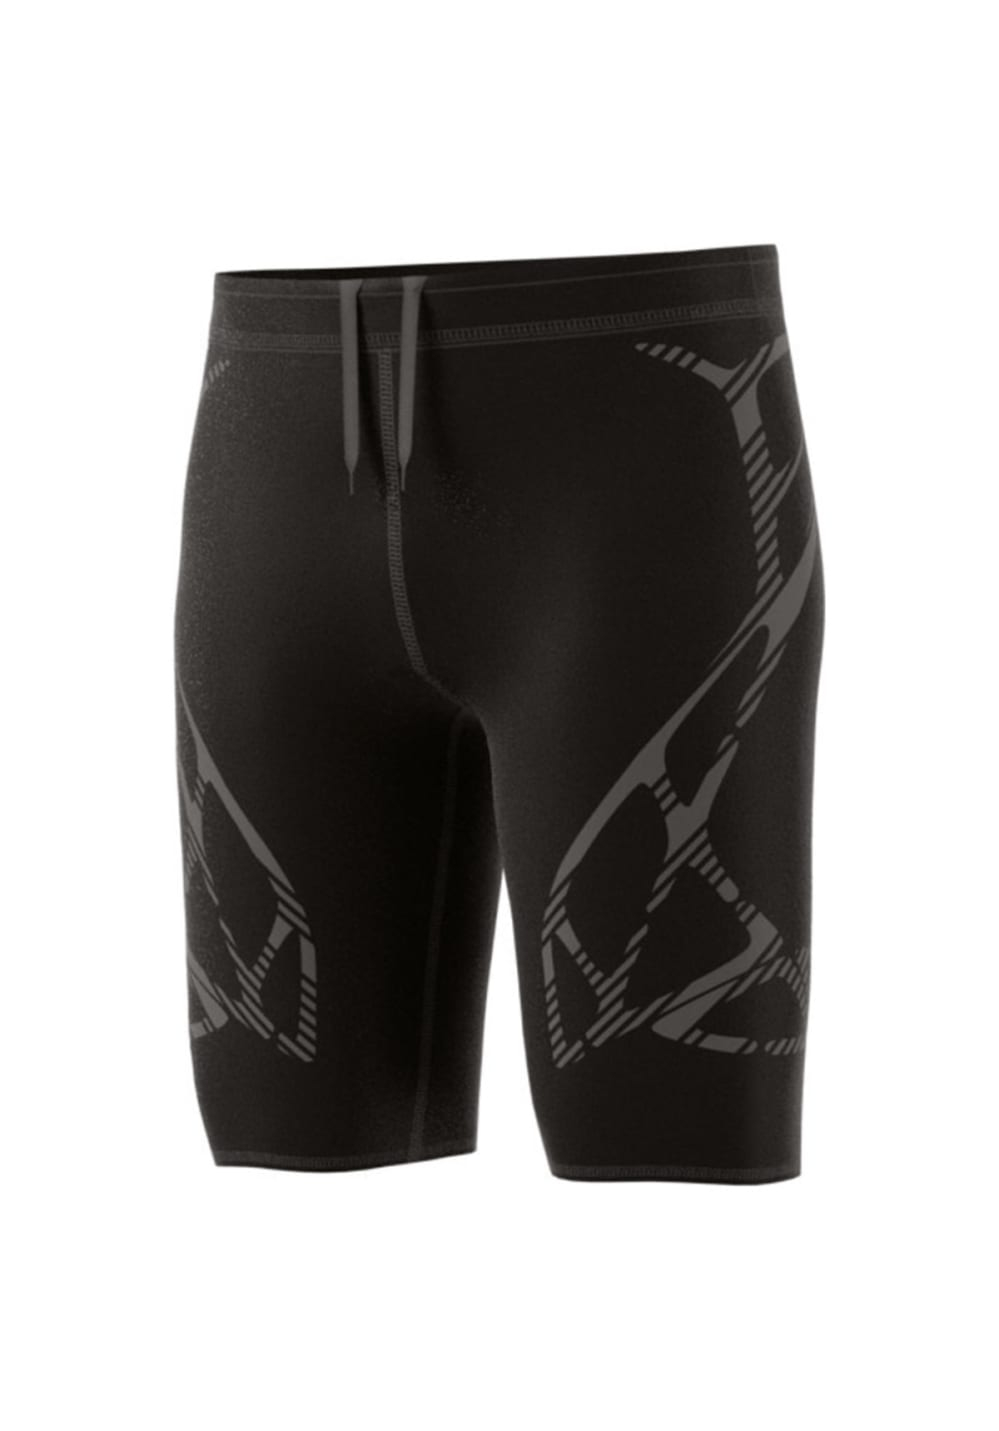 950417cc72306 adidas adiZero Sprintweb Short Tight - Running trousers for Men ...